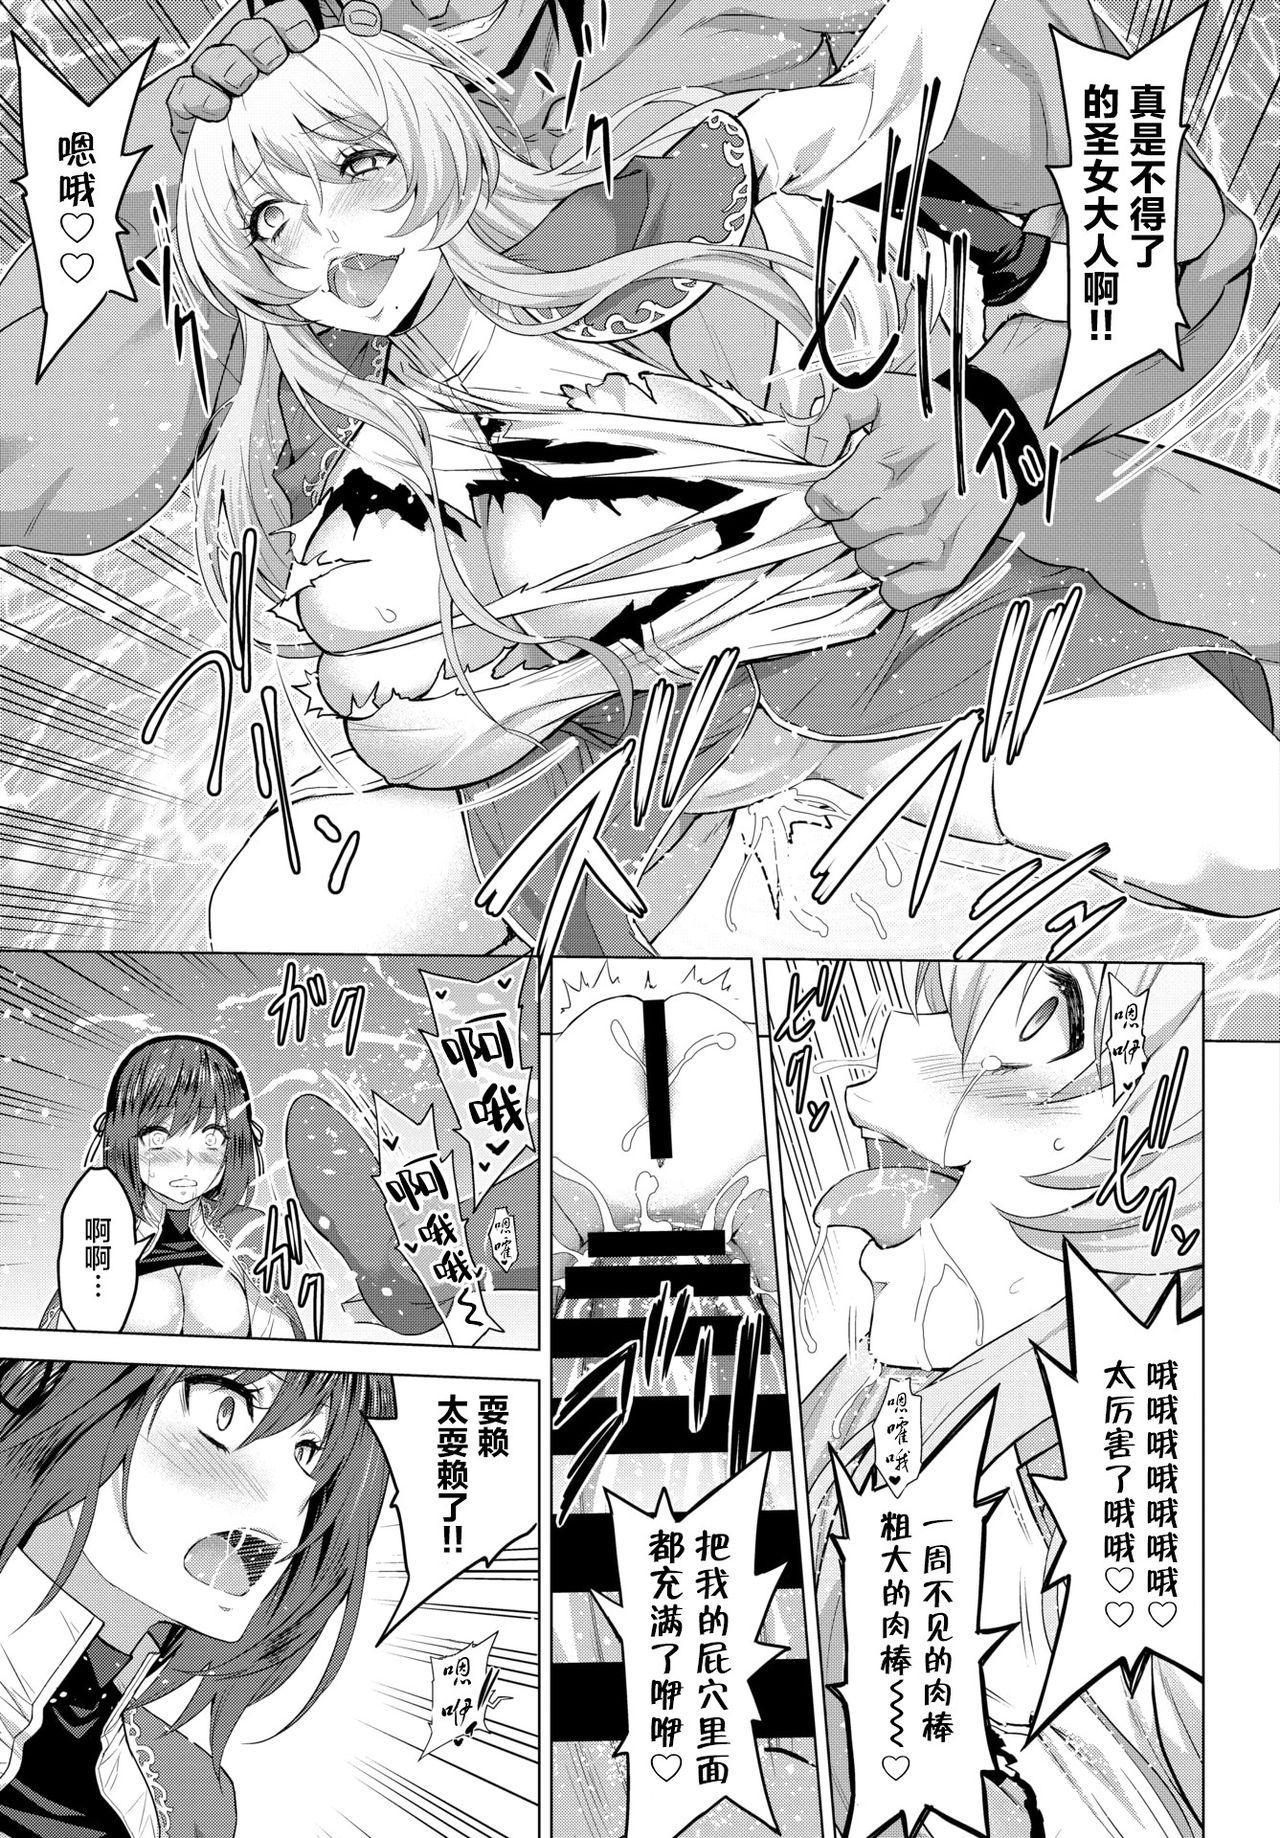 [Yamada Gogogo] Seijo no Rakuin -Annunciation of despair- #04 (COMIC BAVEL 2021-01) [Chinese] [两面包夹汉化组] [Digital] 22